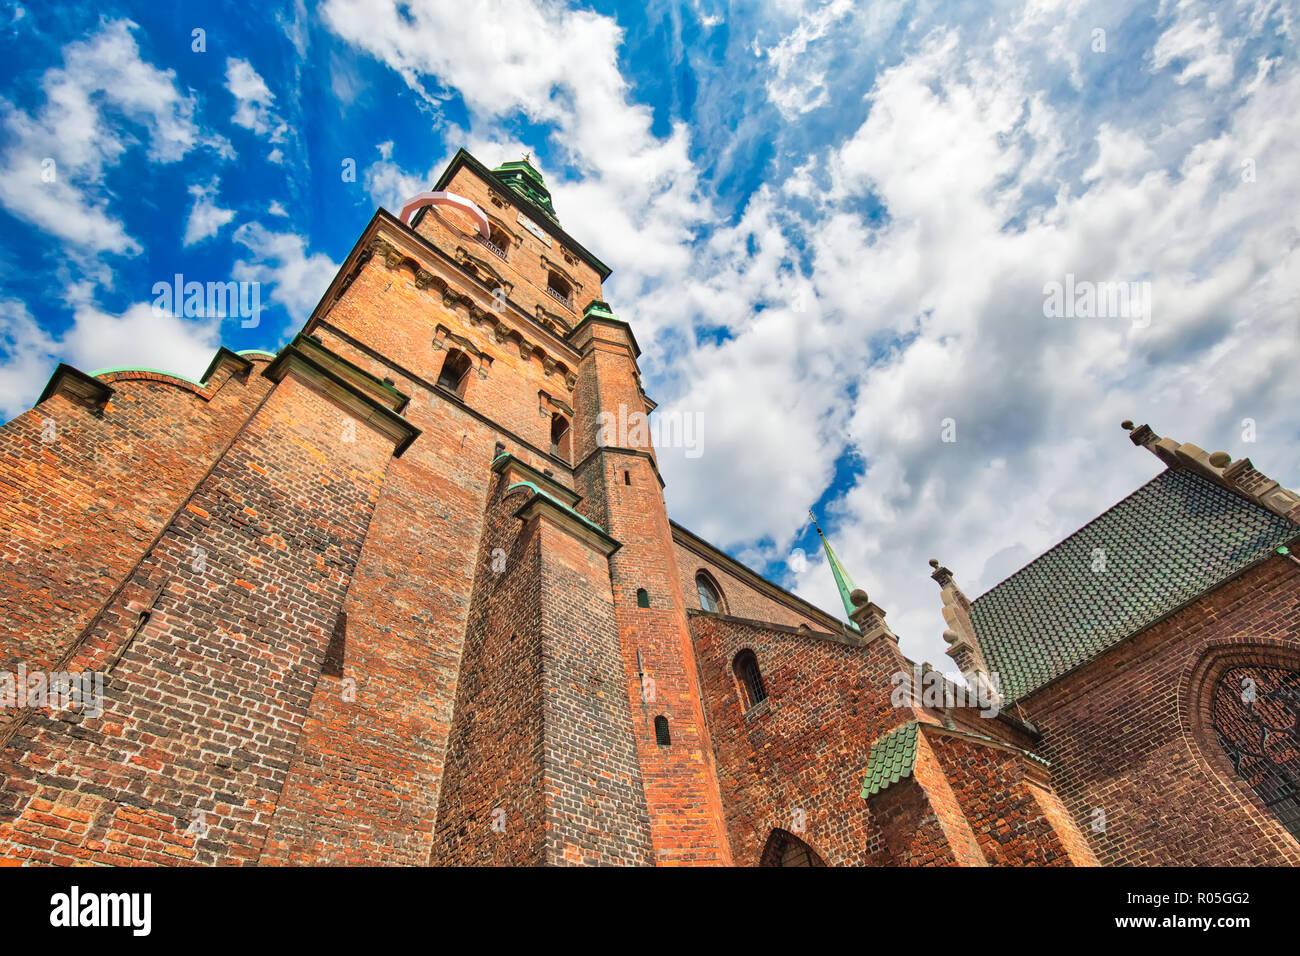 Copenhagen, Saint Nicholas Church (Kunsthallen Nikolaj) - Stock Image